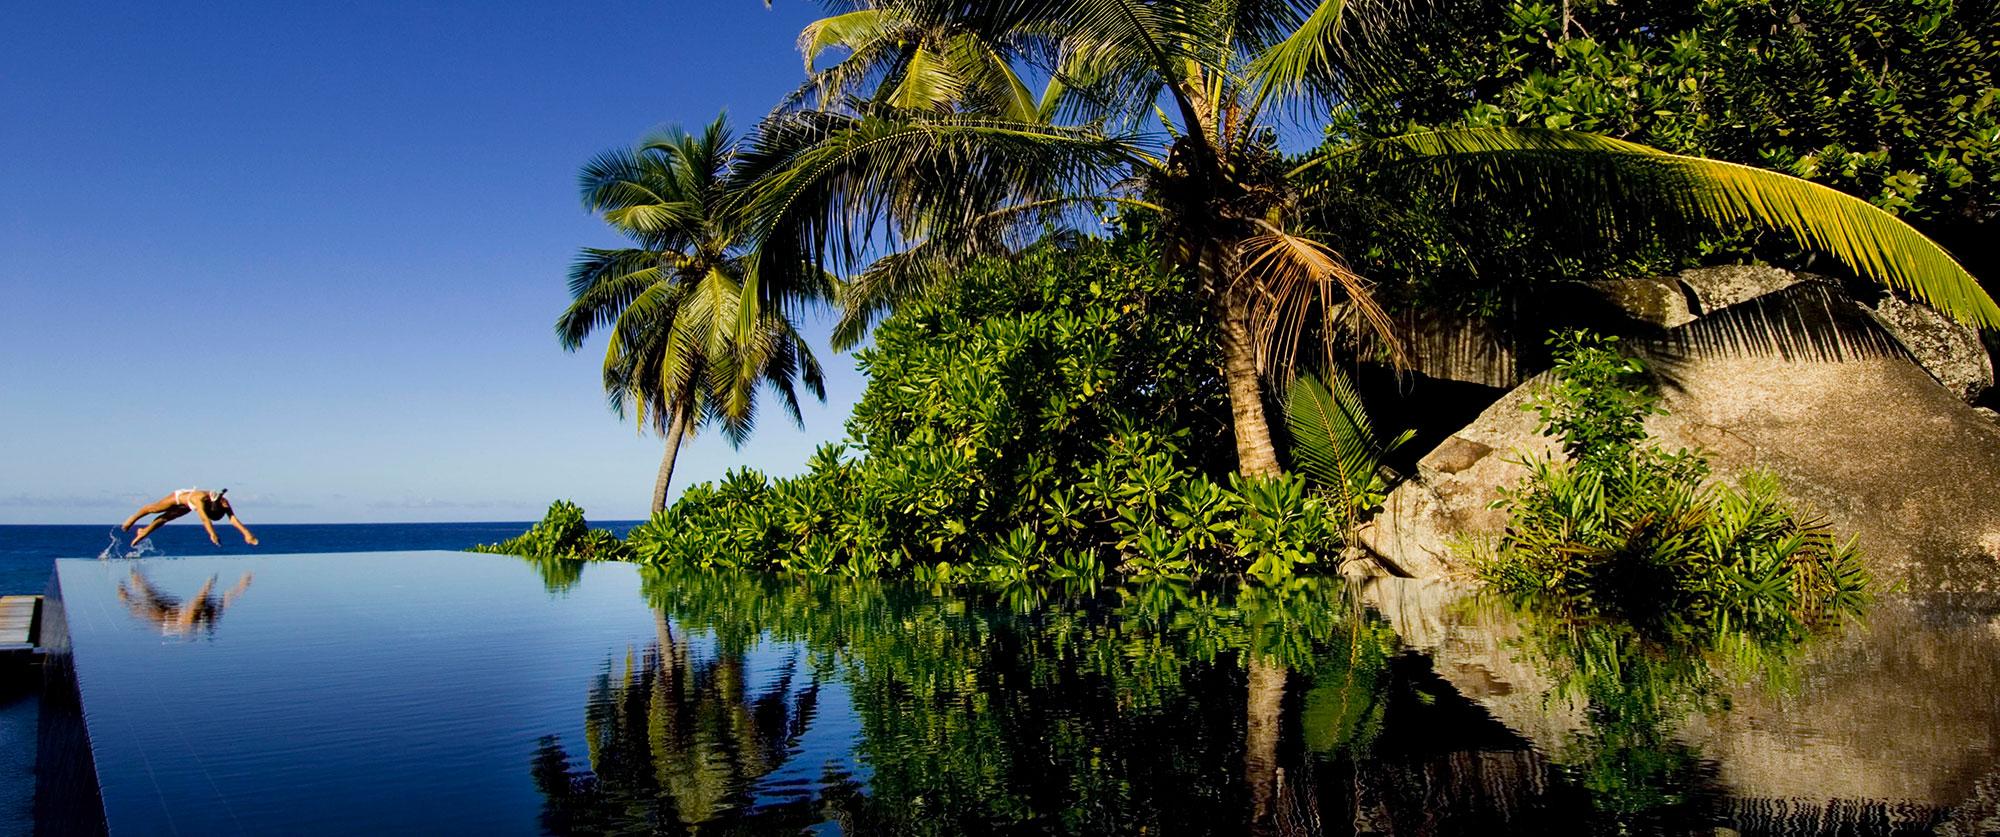 Seychelles - Honeymoon - Romantic Getaway - travel specialist - handcrafted - vacation